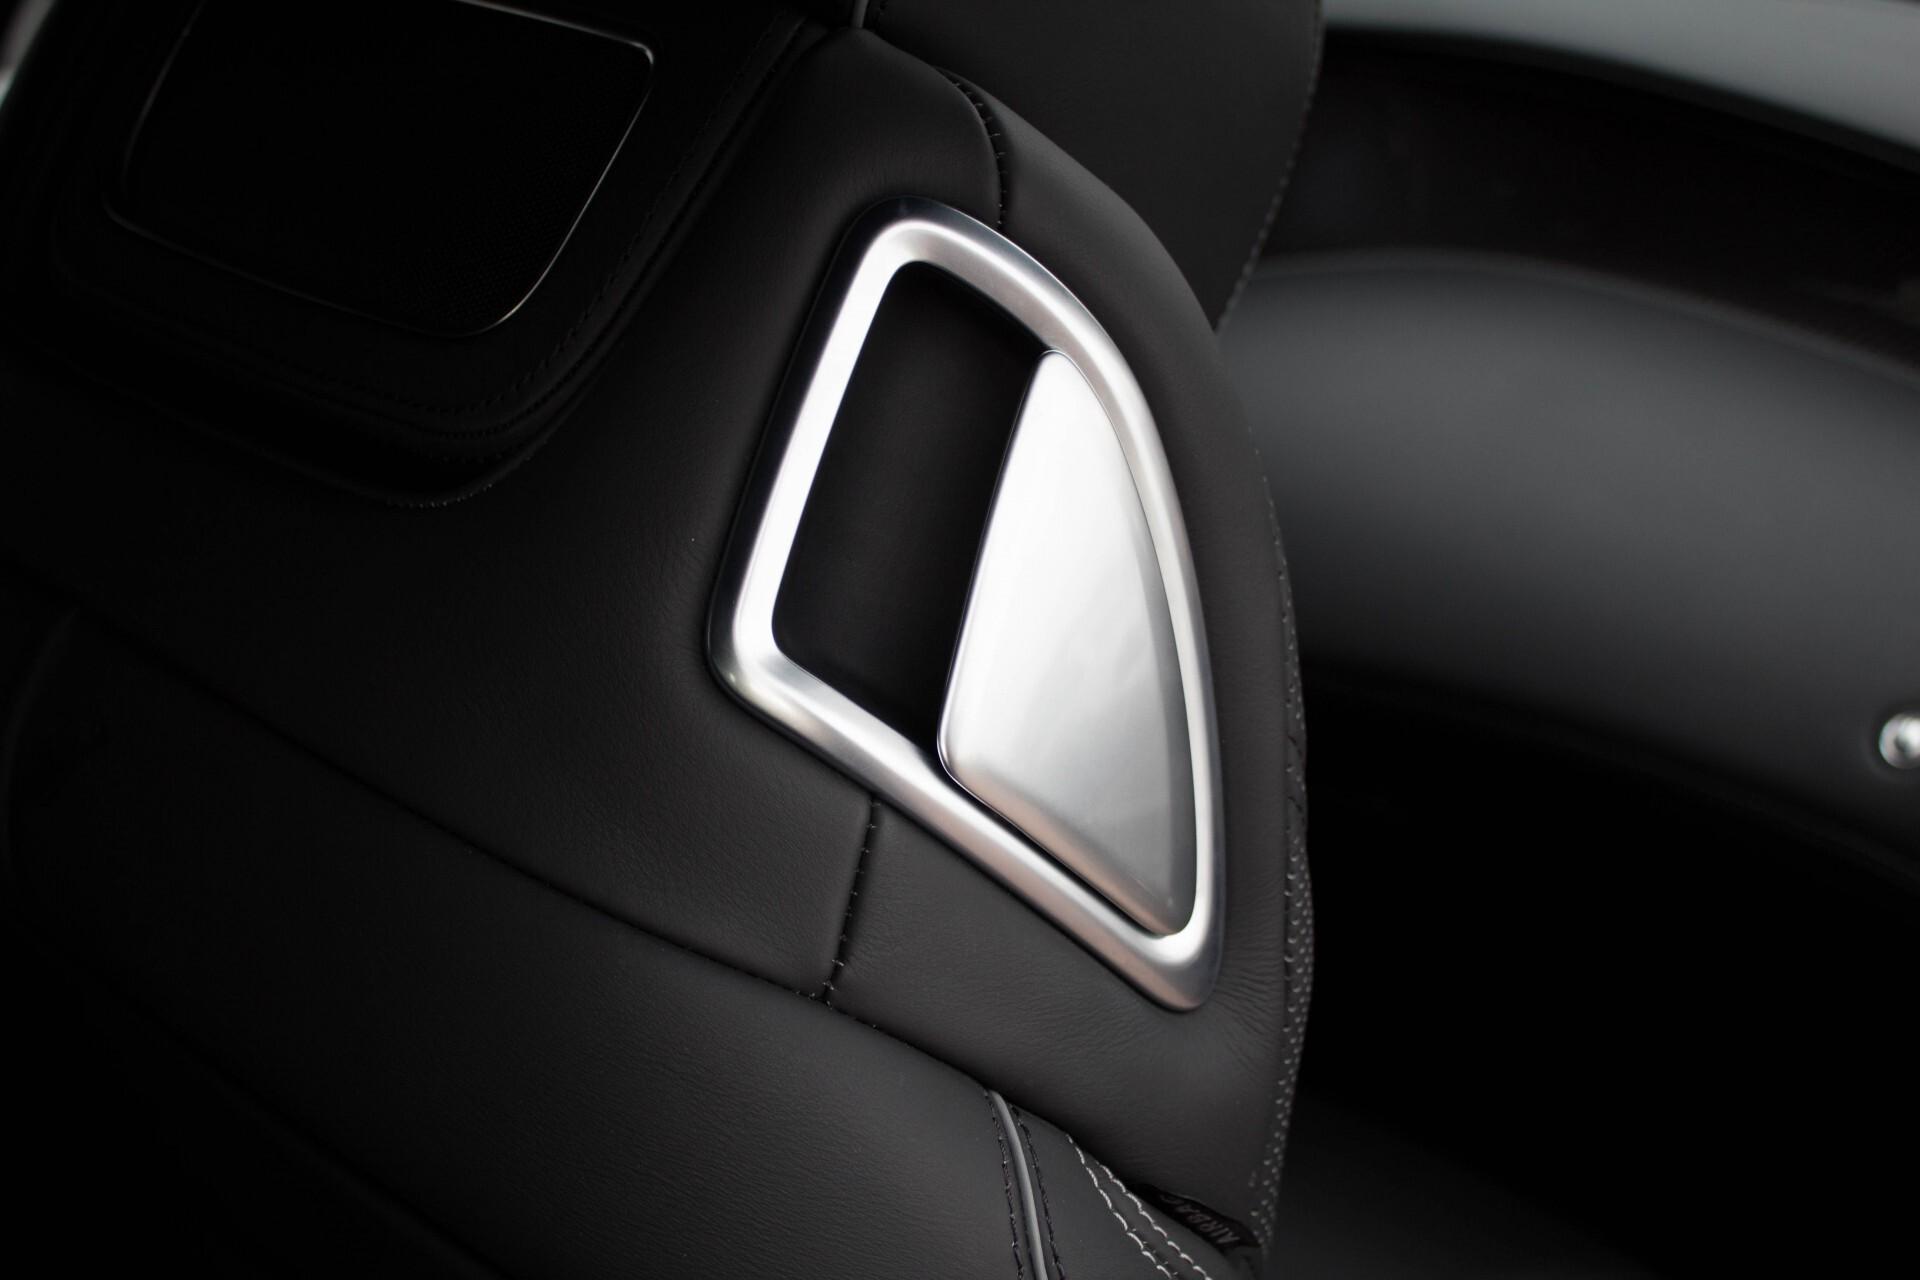 Mercedes-Benz S-Klasse Cabrio 63 AMG 4-M Ceramic/Designo/Carbon/Burmester High End Aut Foto 59